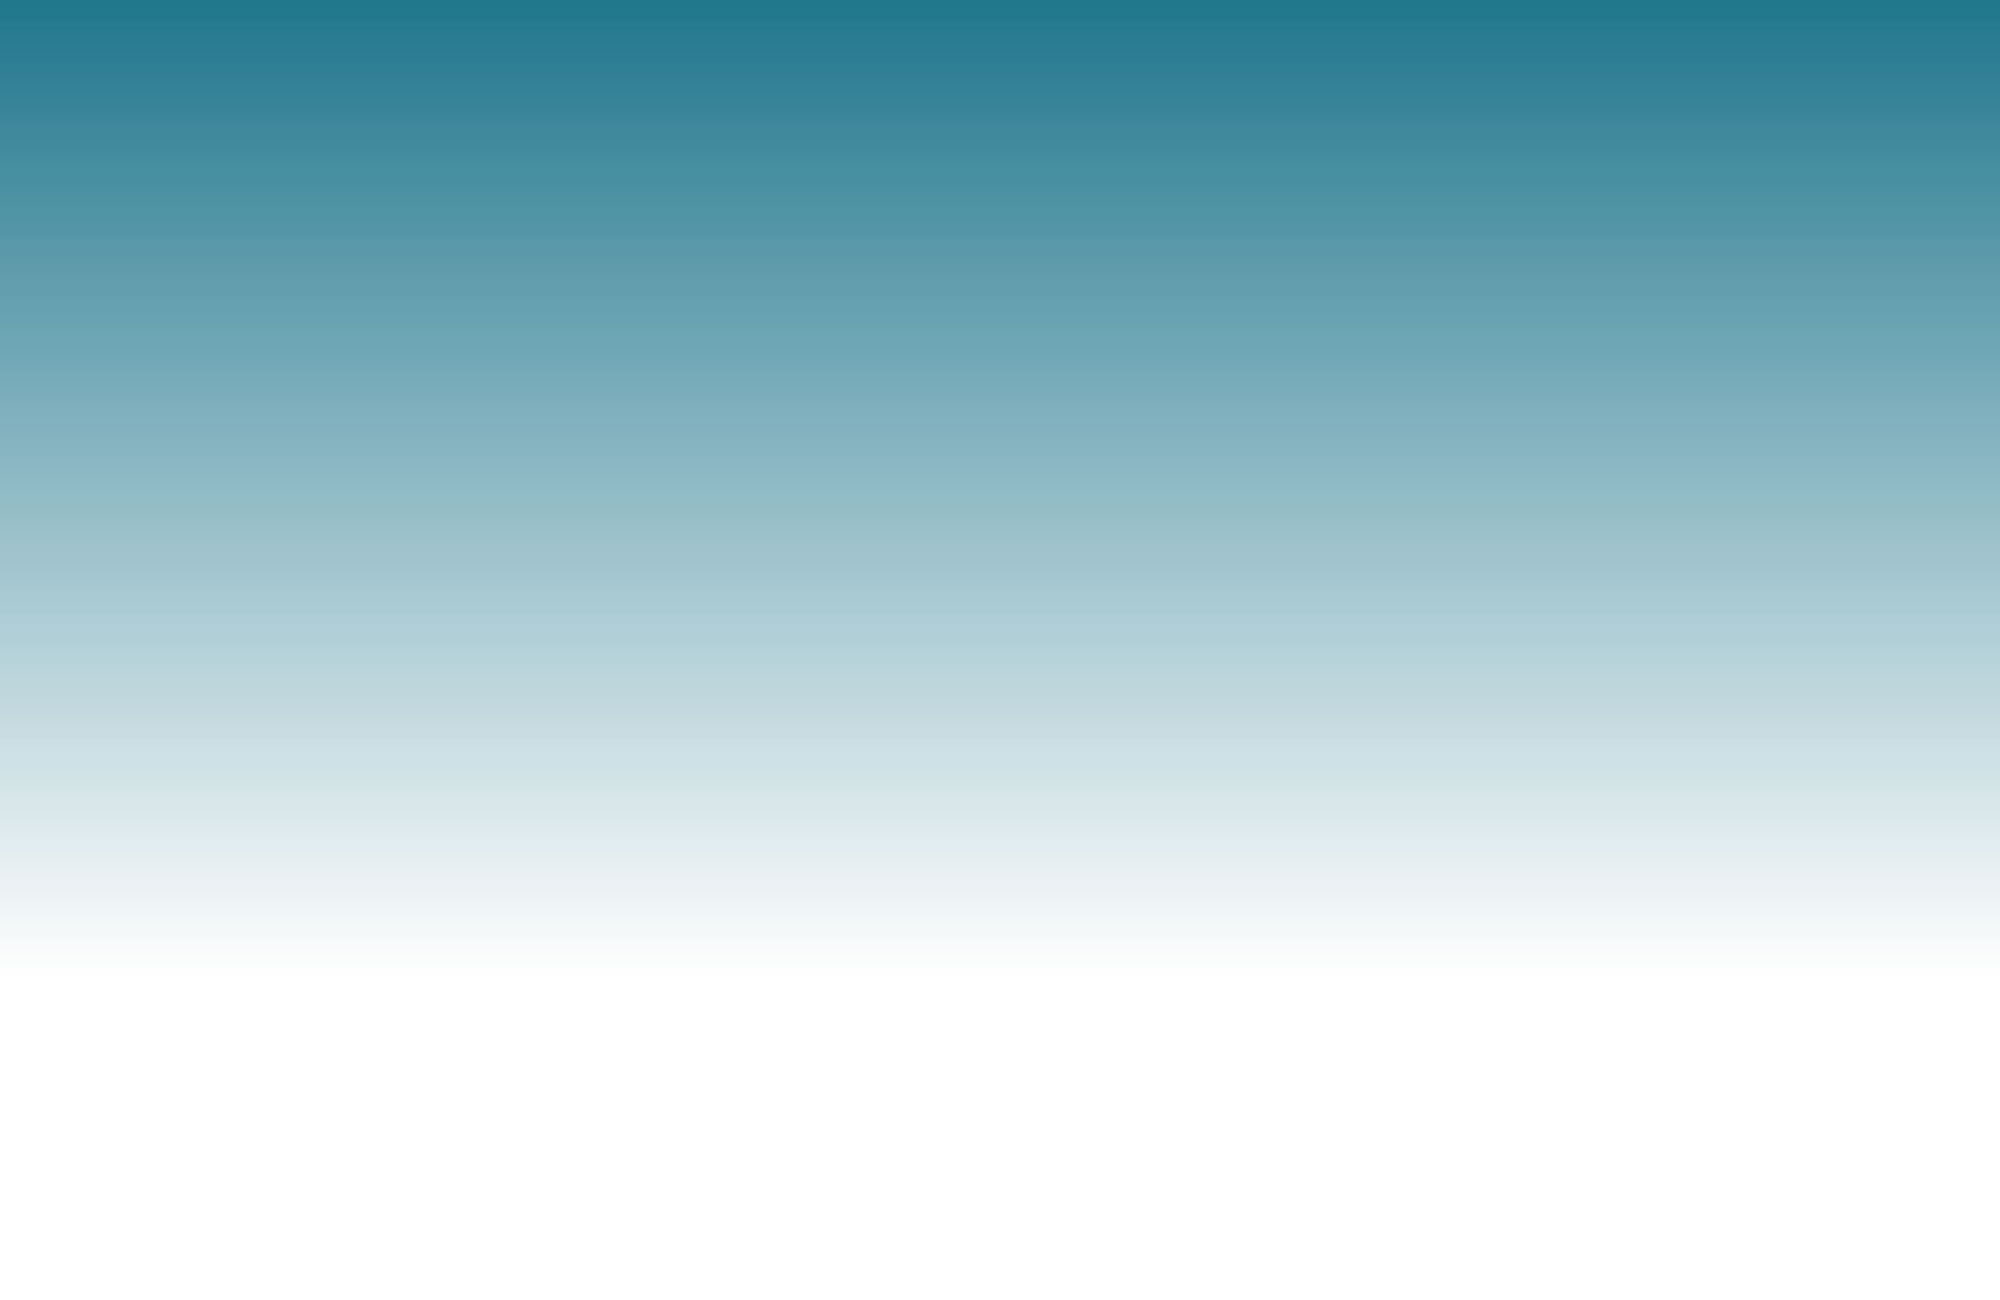 Blue teal gradient background materials science engineering - Wallpaper website ...